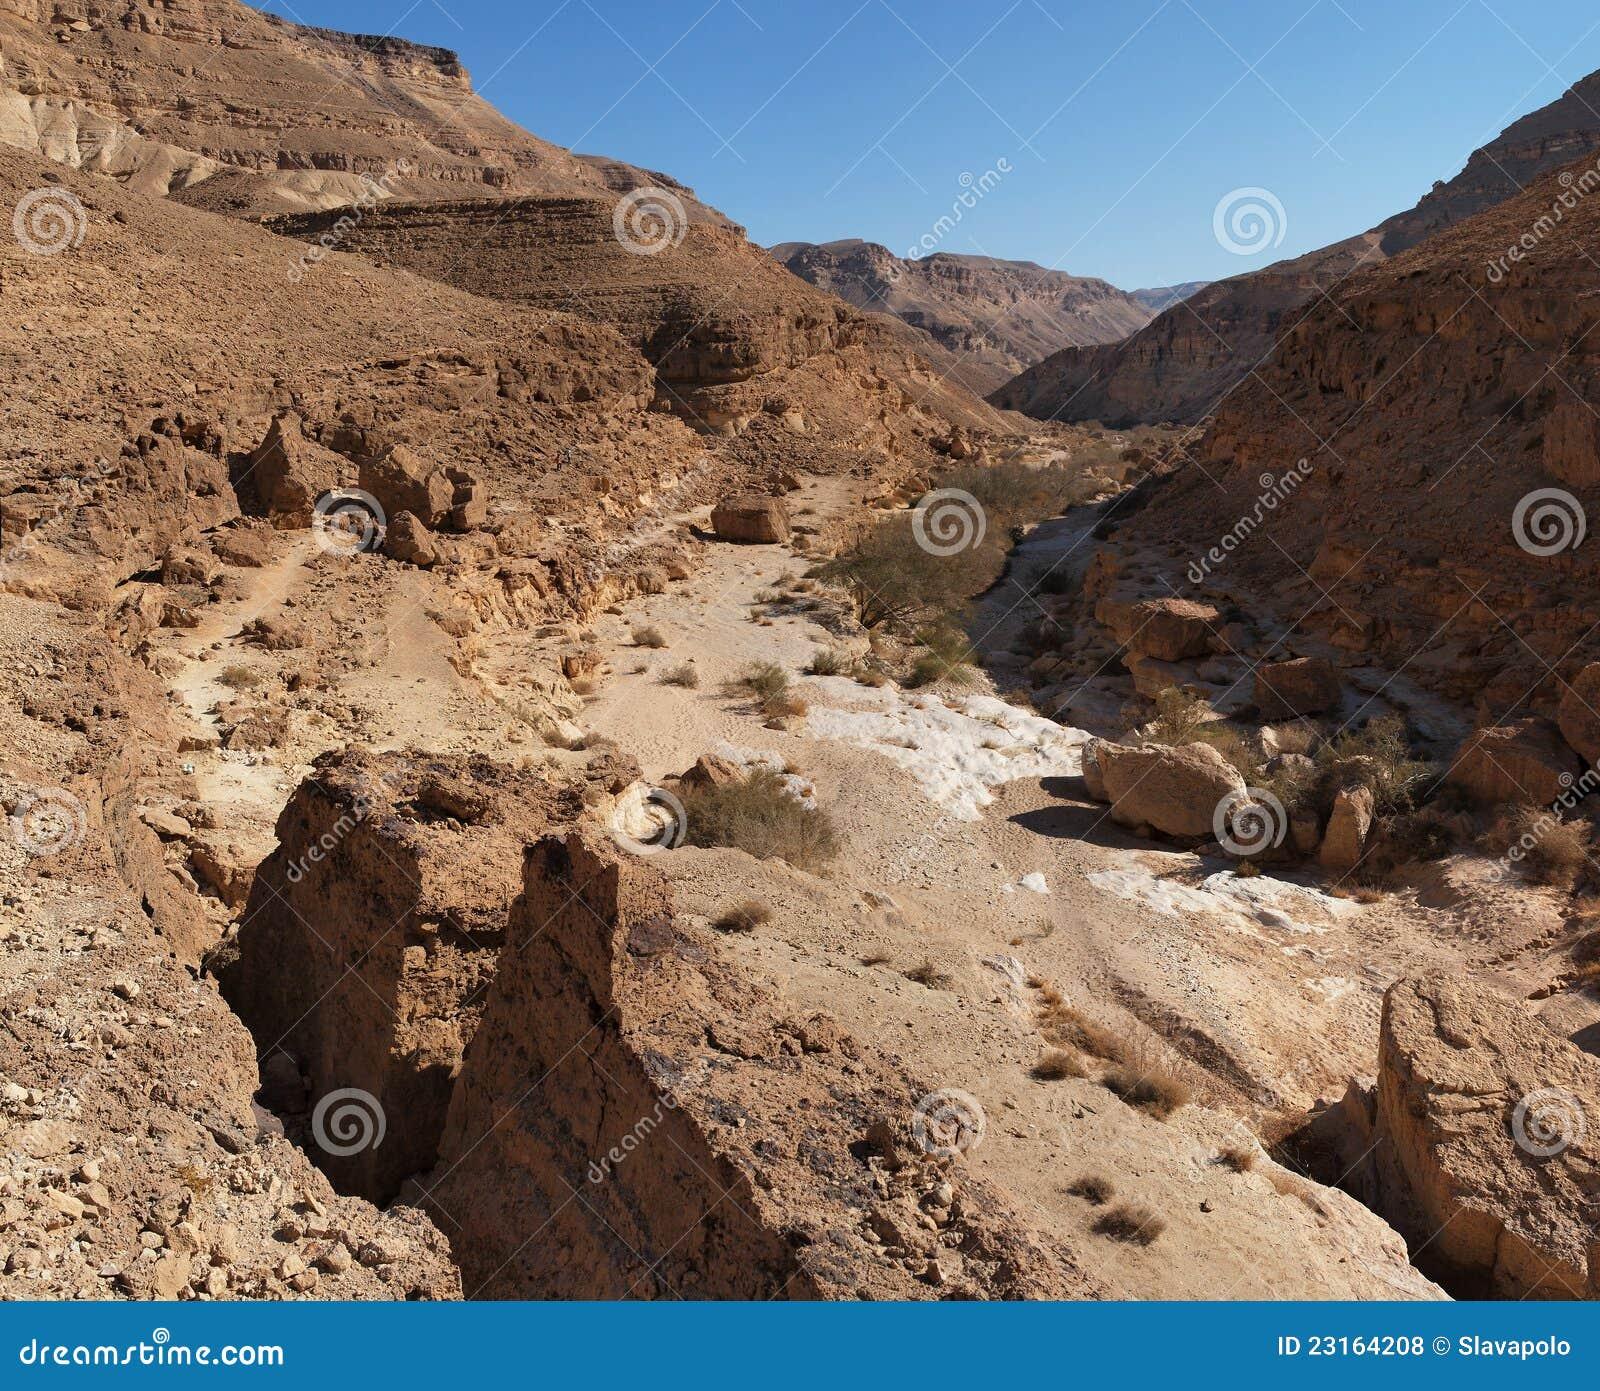 desert canyon royalty free stock photos   image 23164208